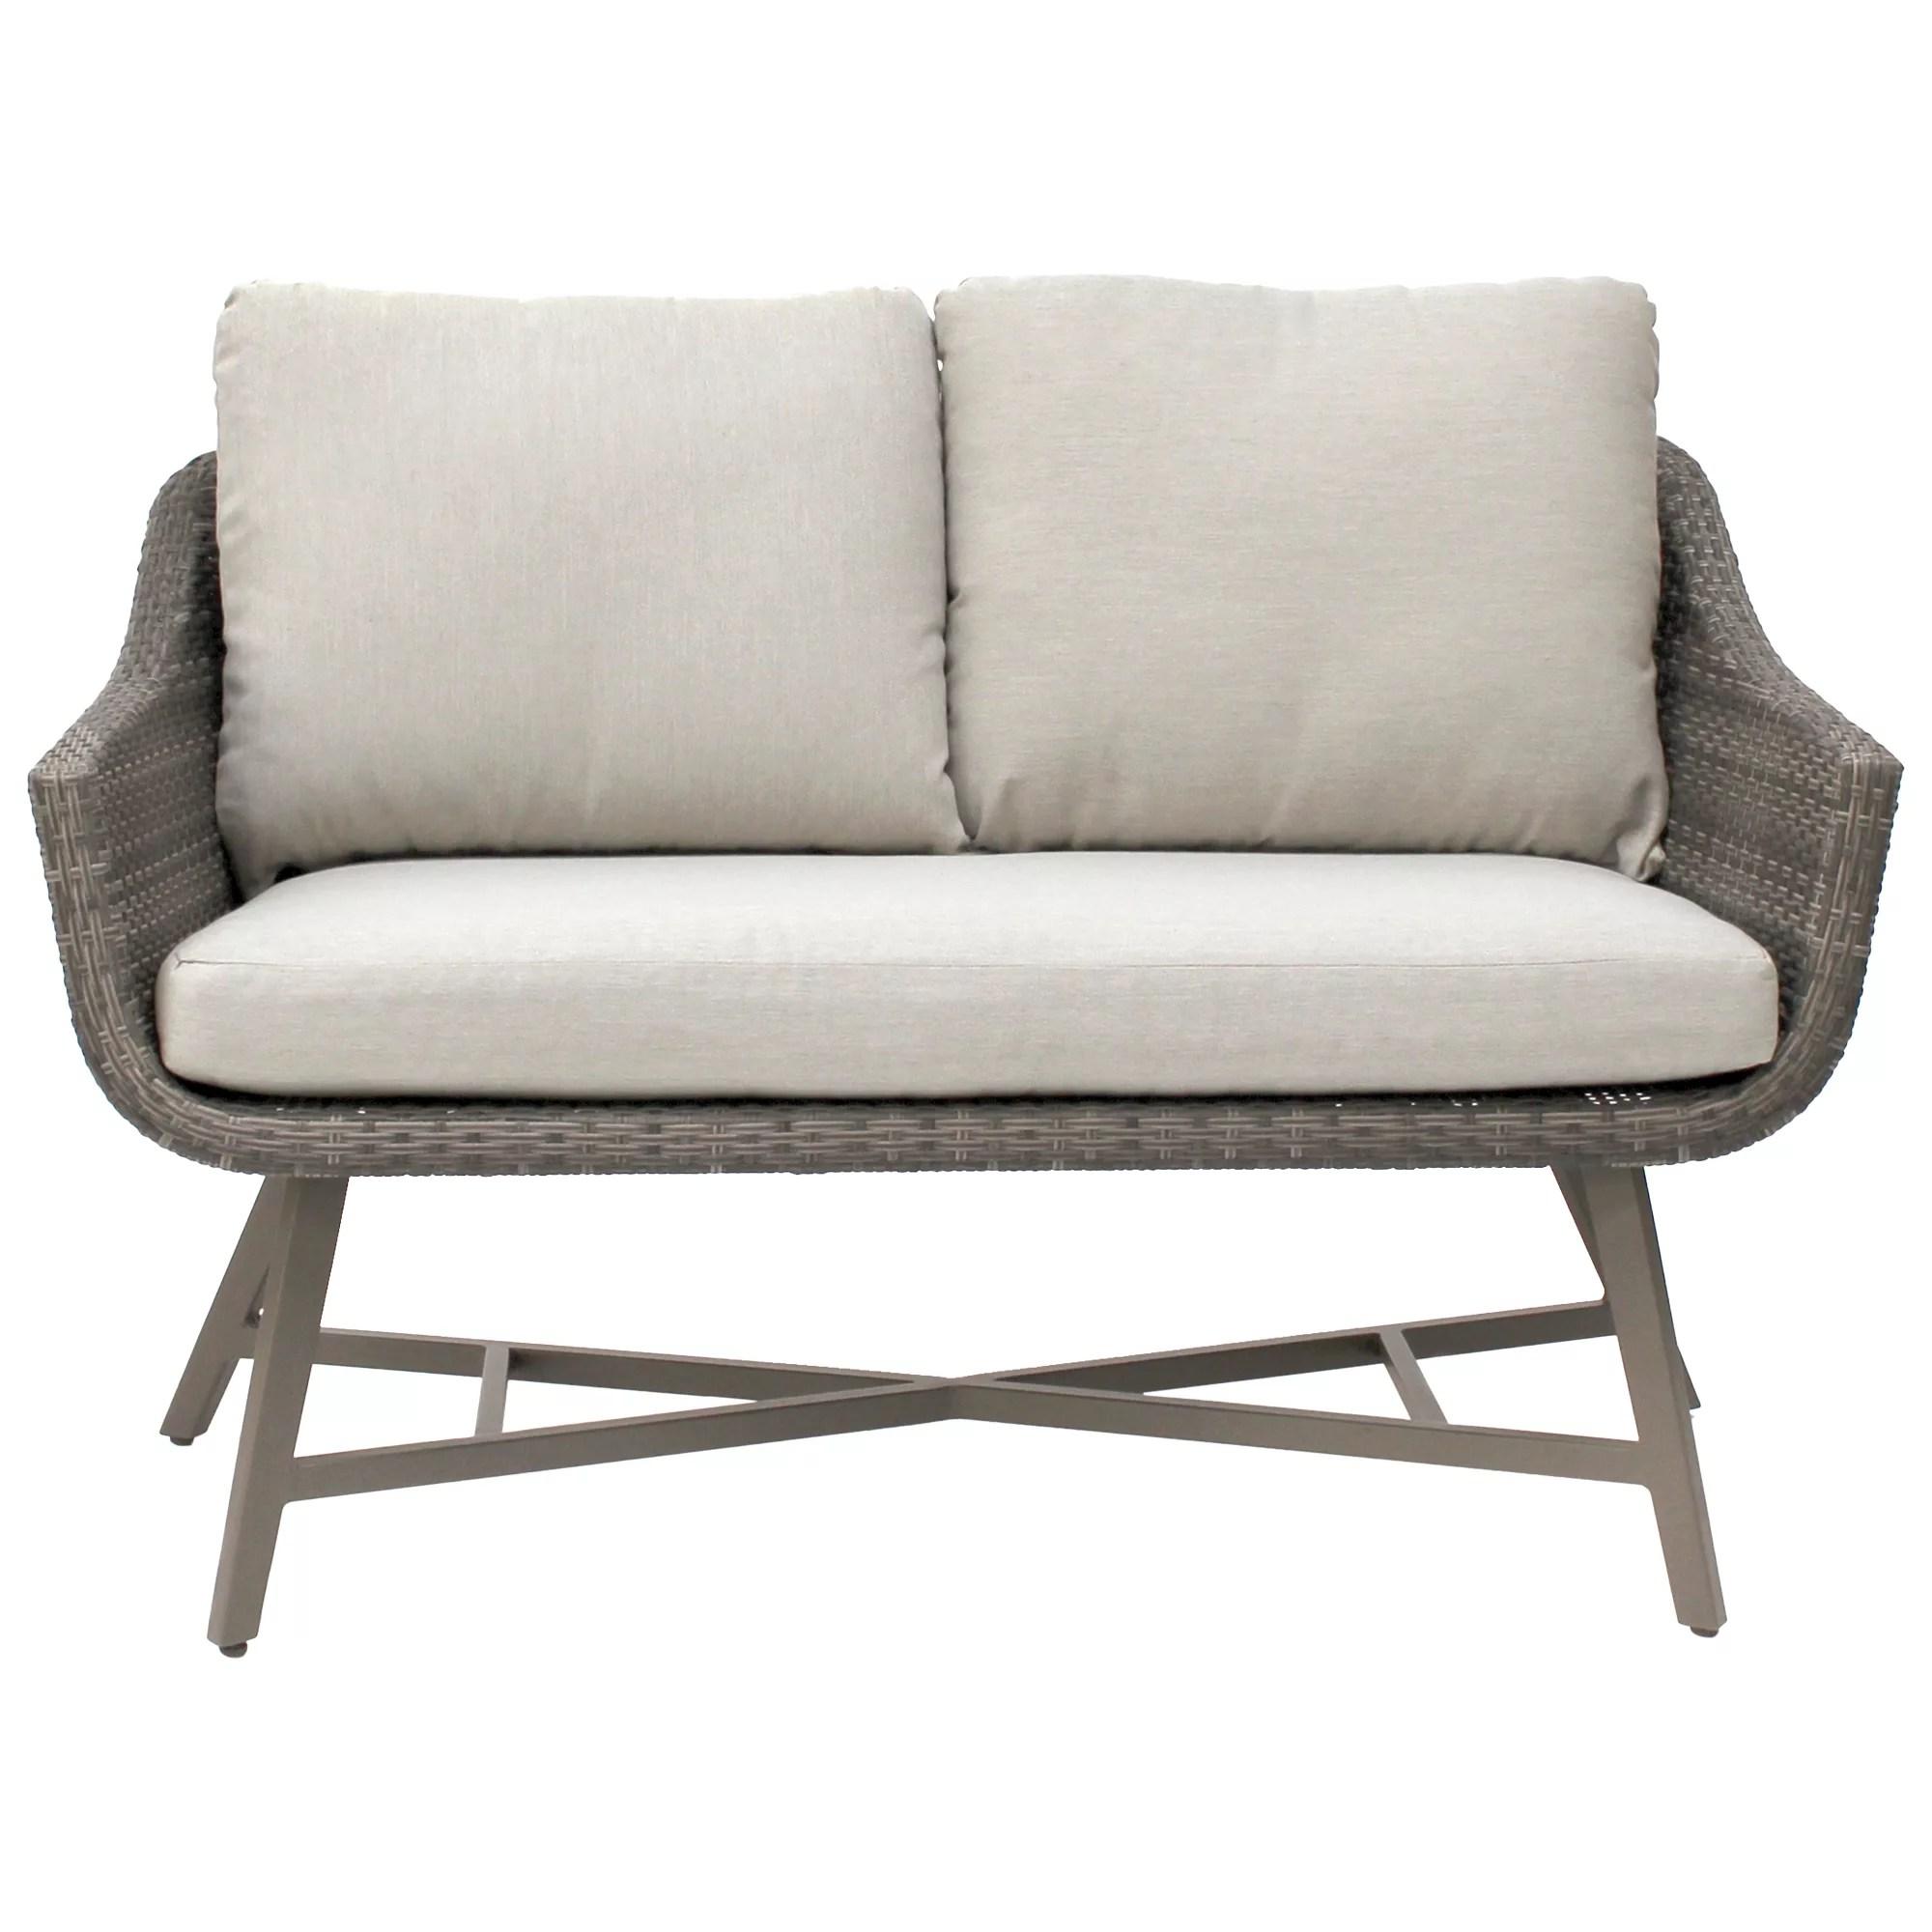 dining chair seat covers john lewis ergonomic joe rogan garden pads dante